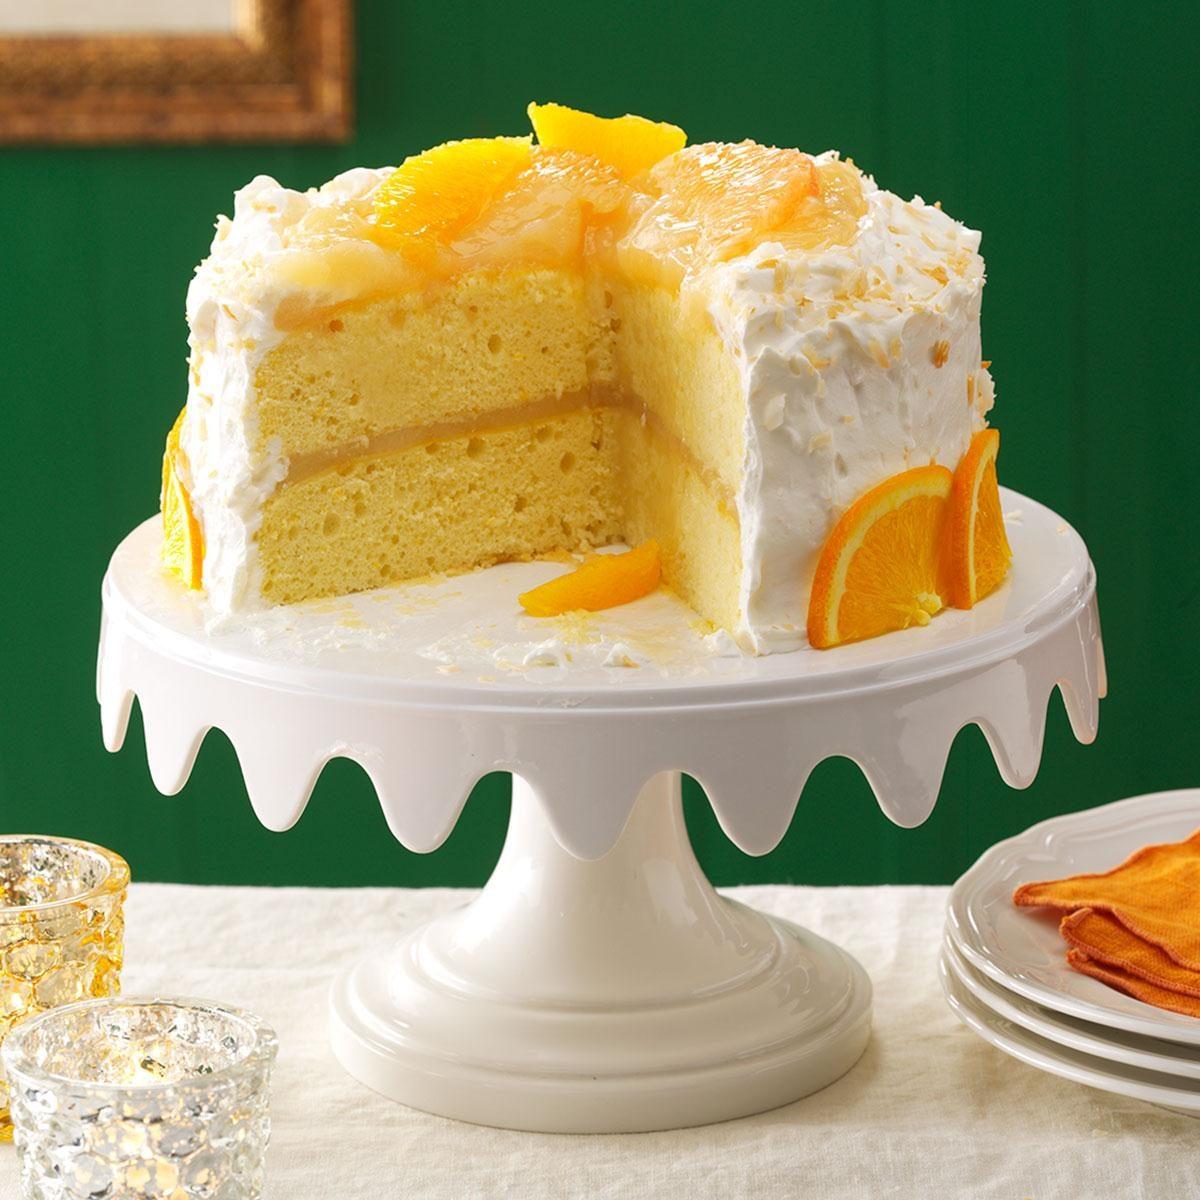 12 Months Of Birthday Cake Recipes